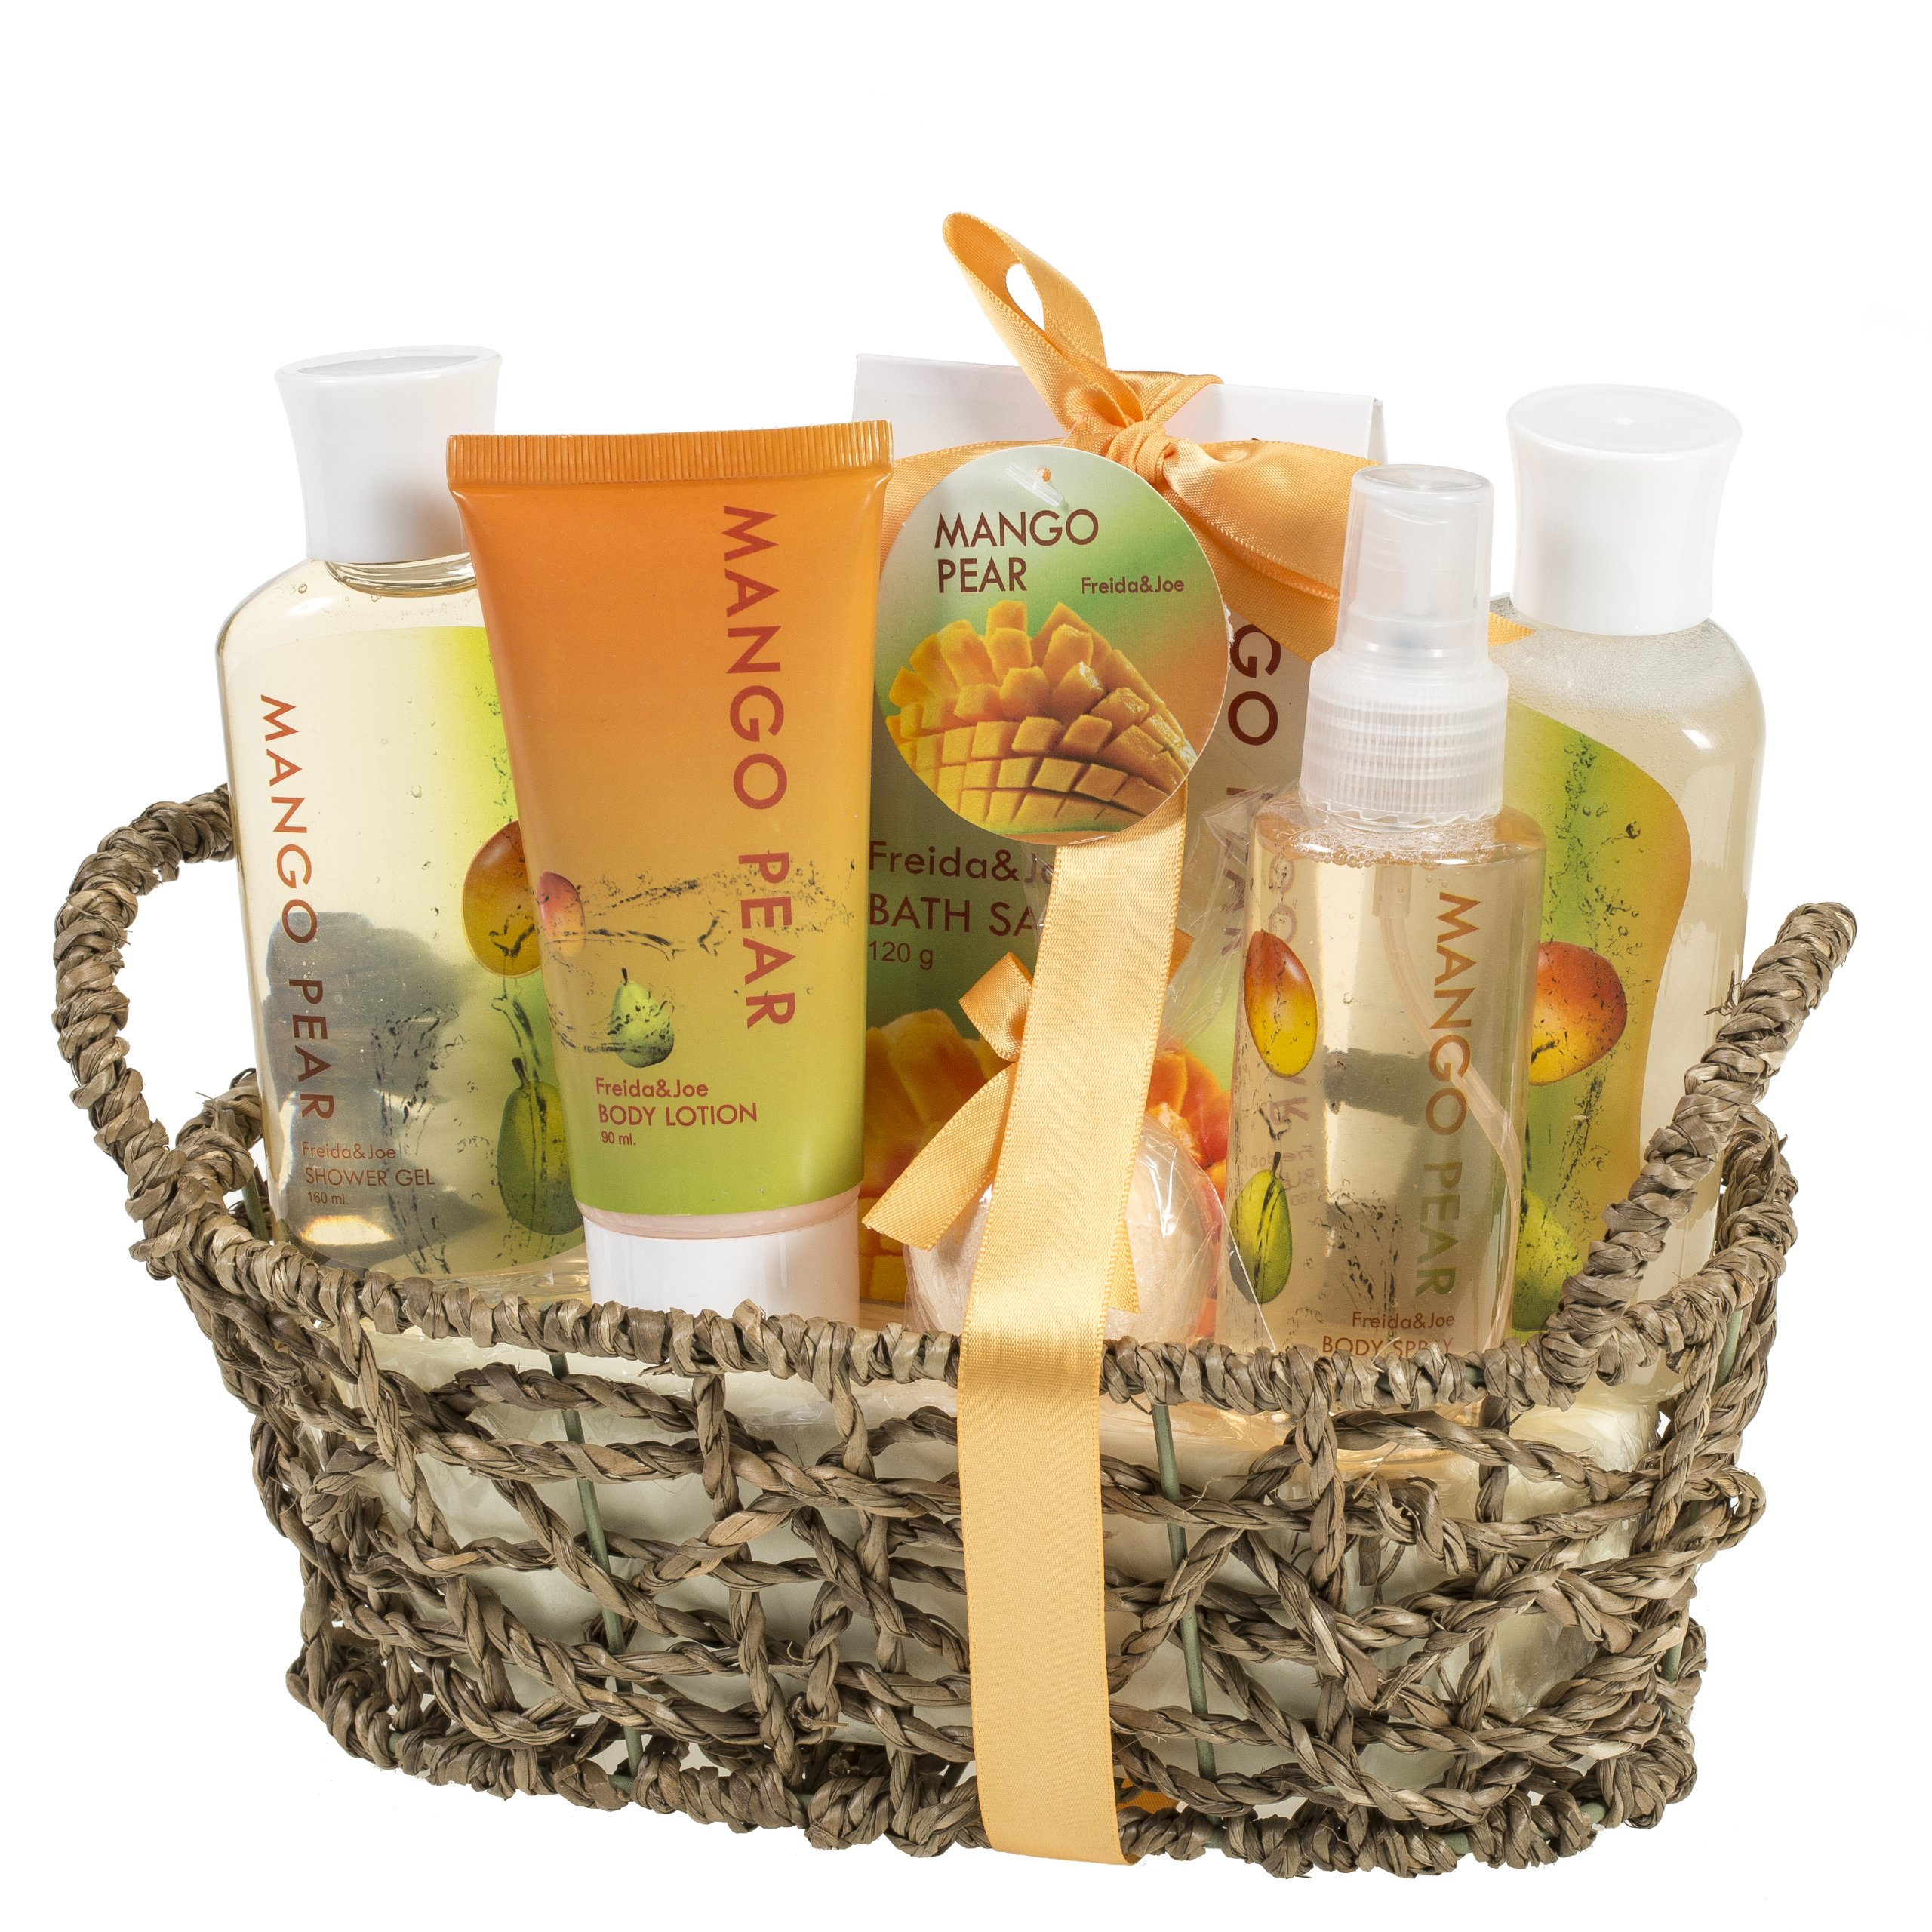 Aromatic Autumn Mango-Pear Home Spa Experience: Women's Fall Season Gift Set Features Shower Gel, Bubble Bath, Bath Salt, Body Lotion, Body Spray, and Bath Fizzer in Delicate Woven Basket by Freida and Joe